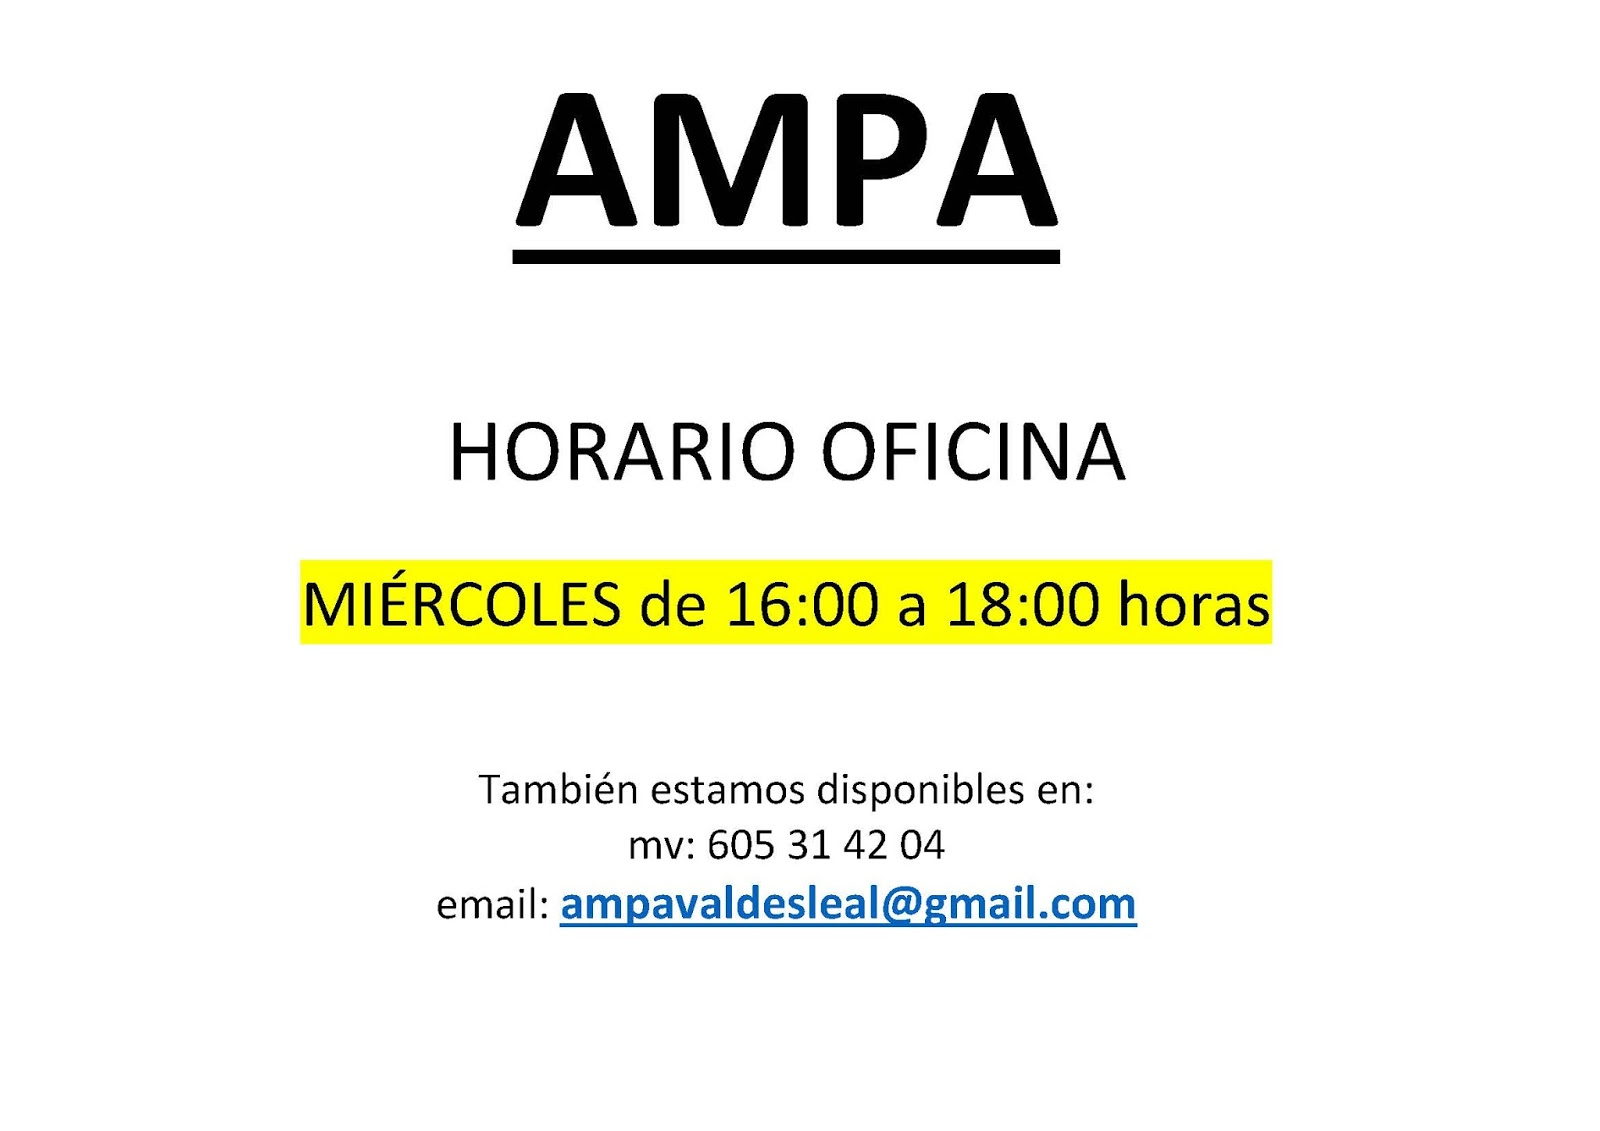 Ampa ceip vald s leal horario oficina ampa invierno for Horario oficinas ibercaja